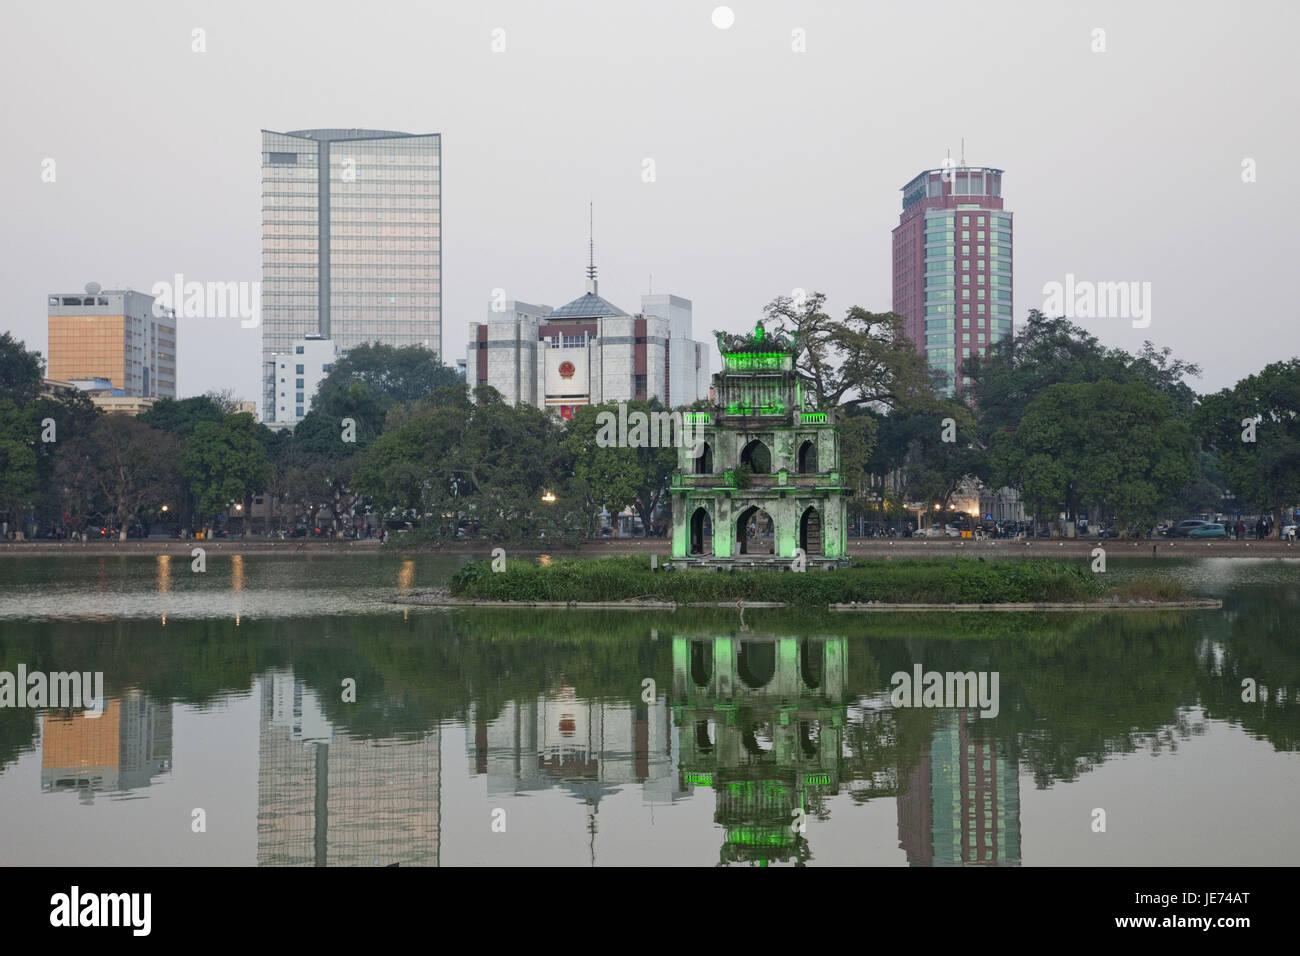 Vietnam, Hanoi, Hoan Kiem lake and tortoise's tower, - Stock Image